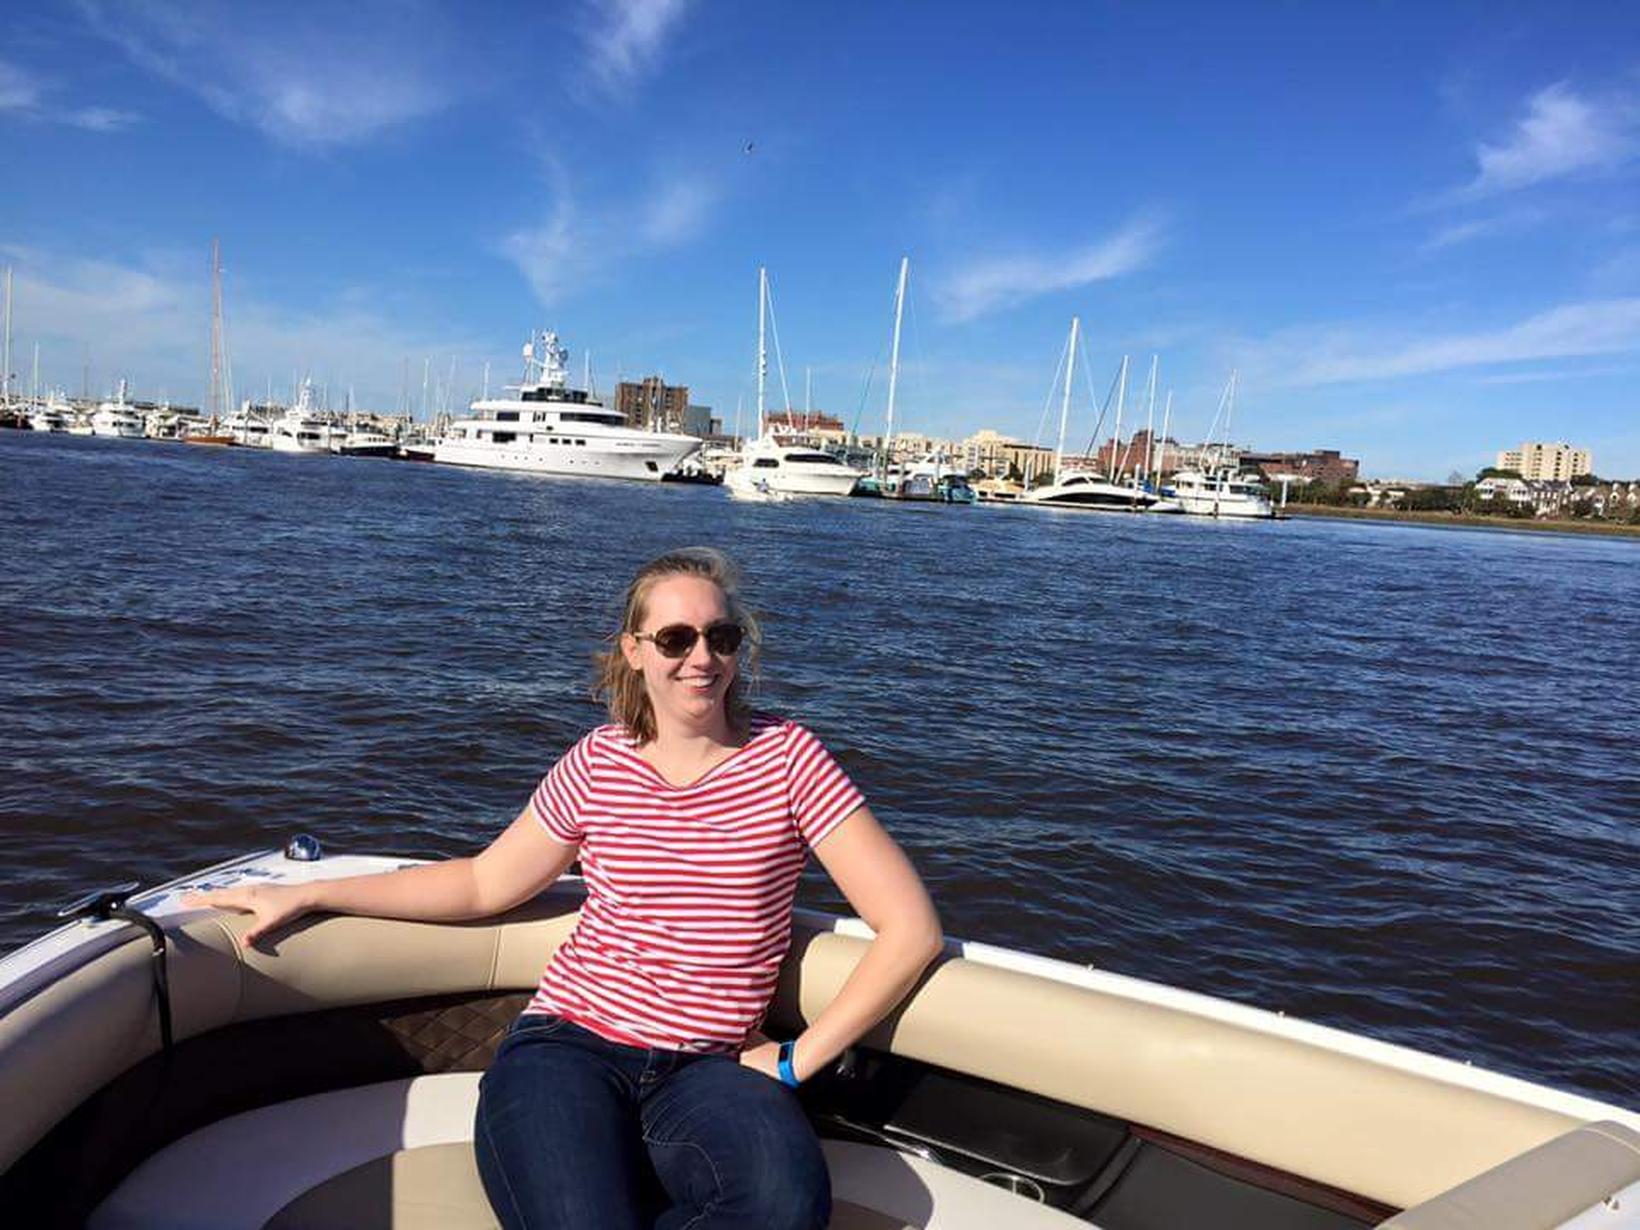 Katherine from Arlington, Massachusetts, United States